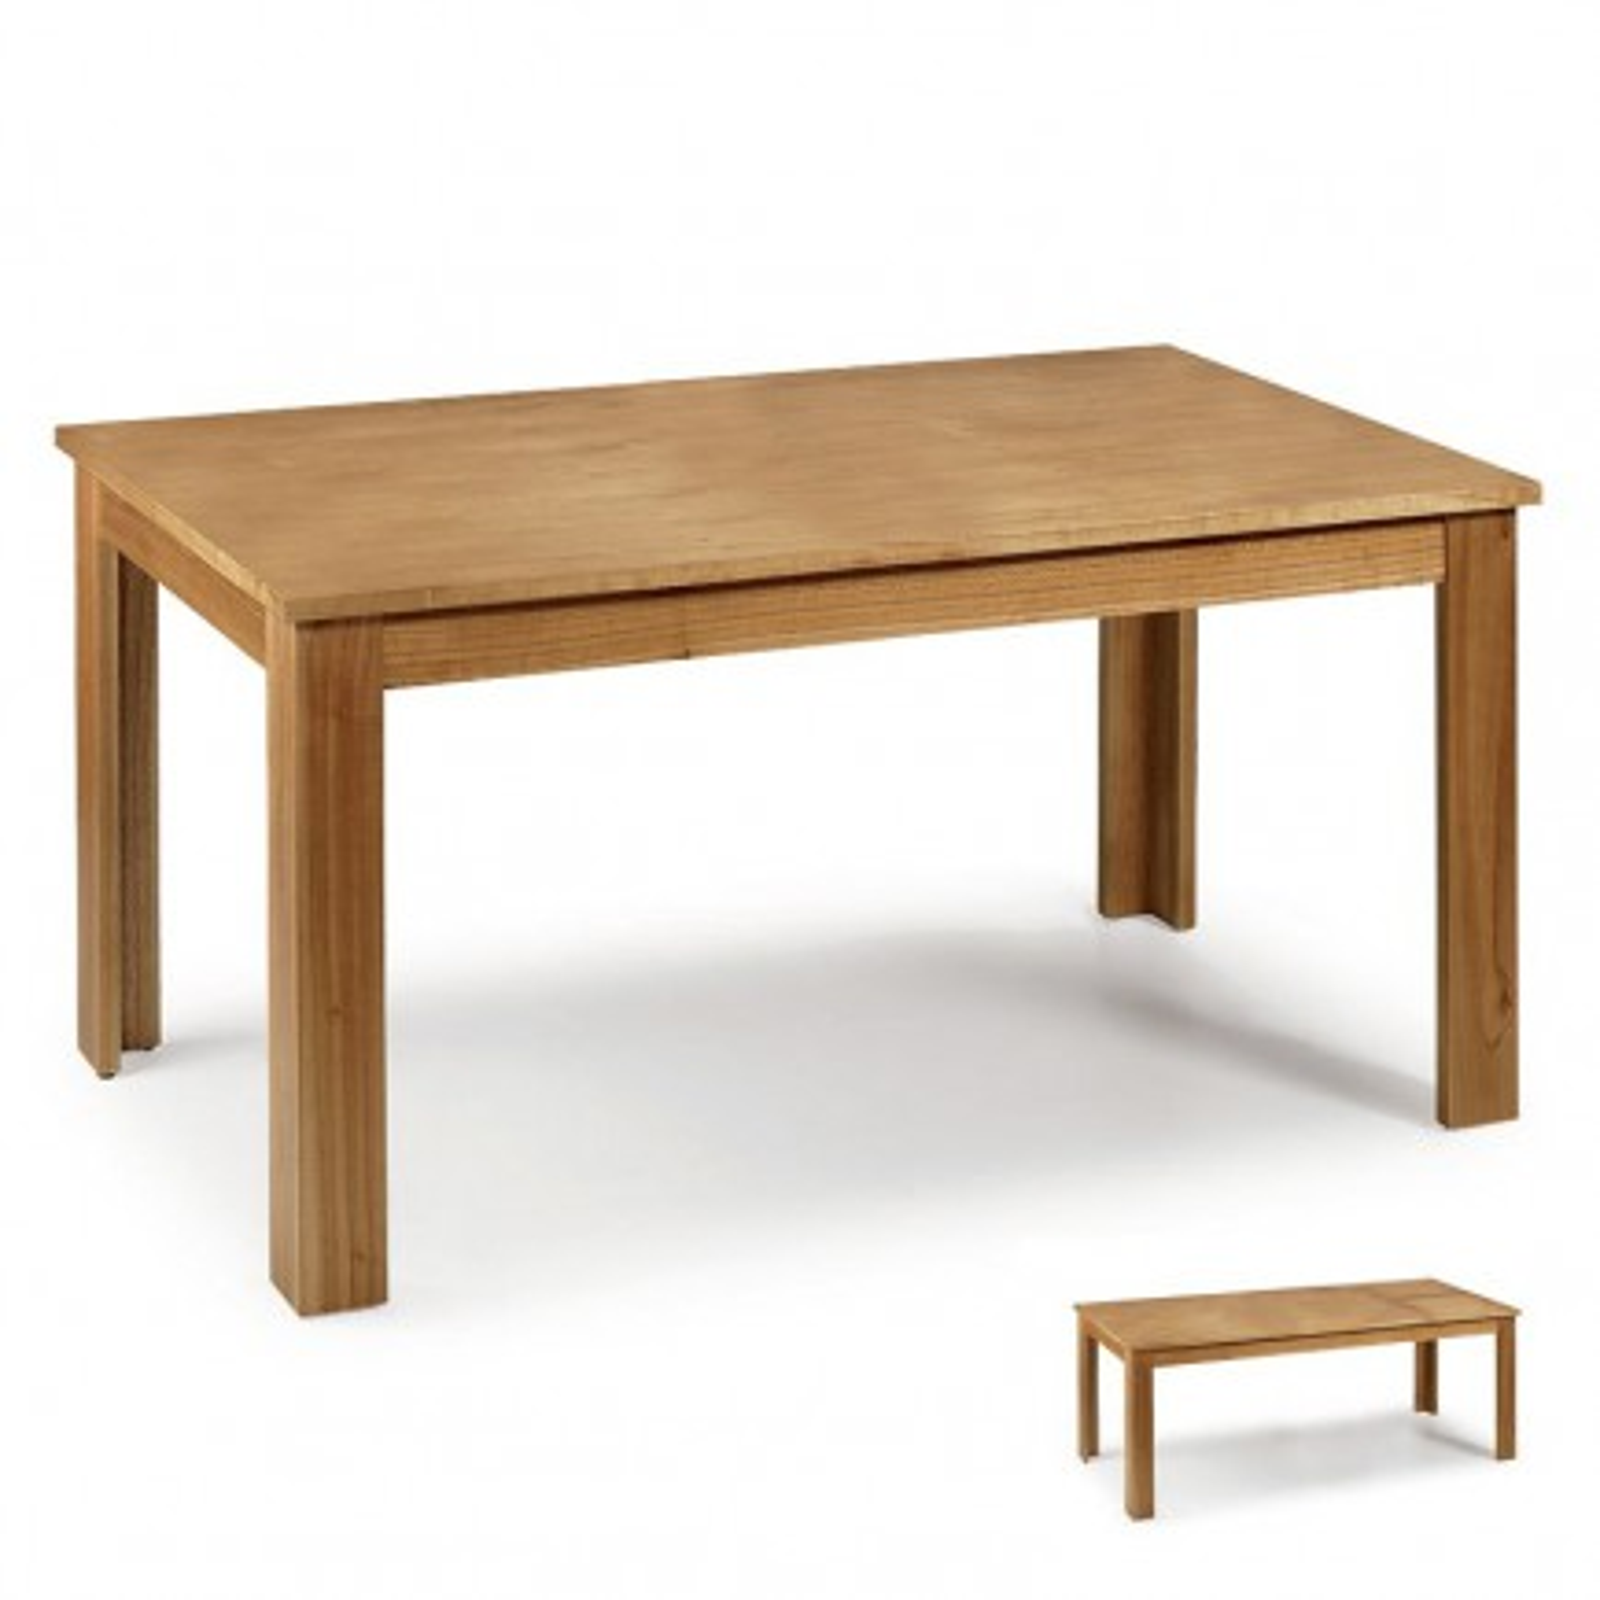 Table de repas rallonge en bois massif Mindy Beaubois